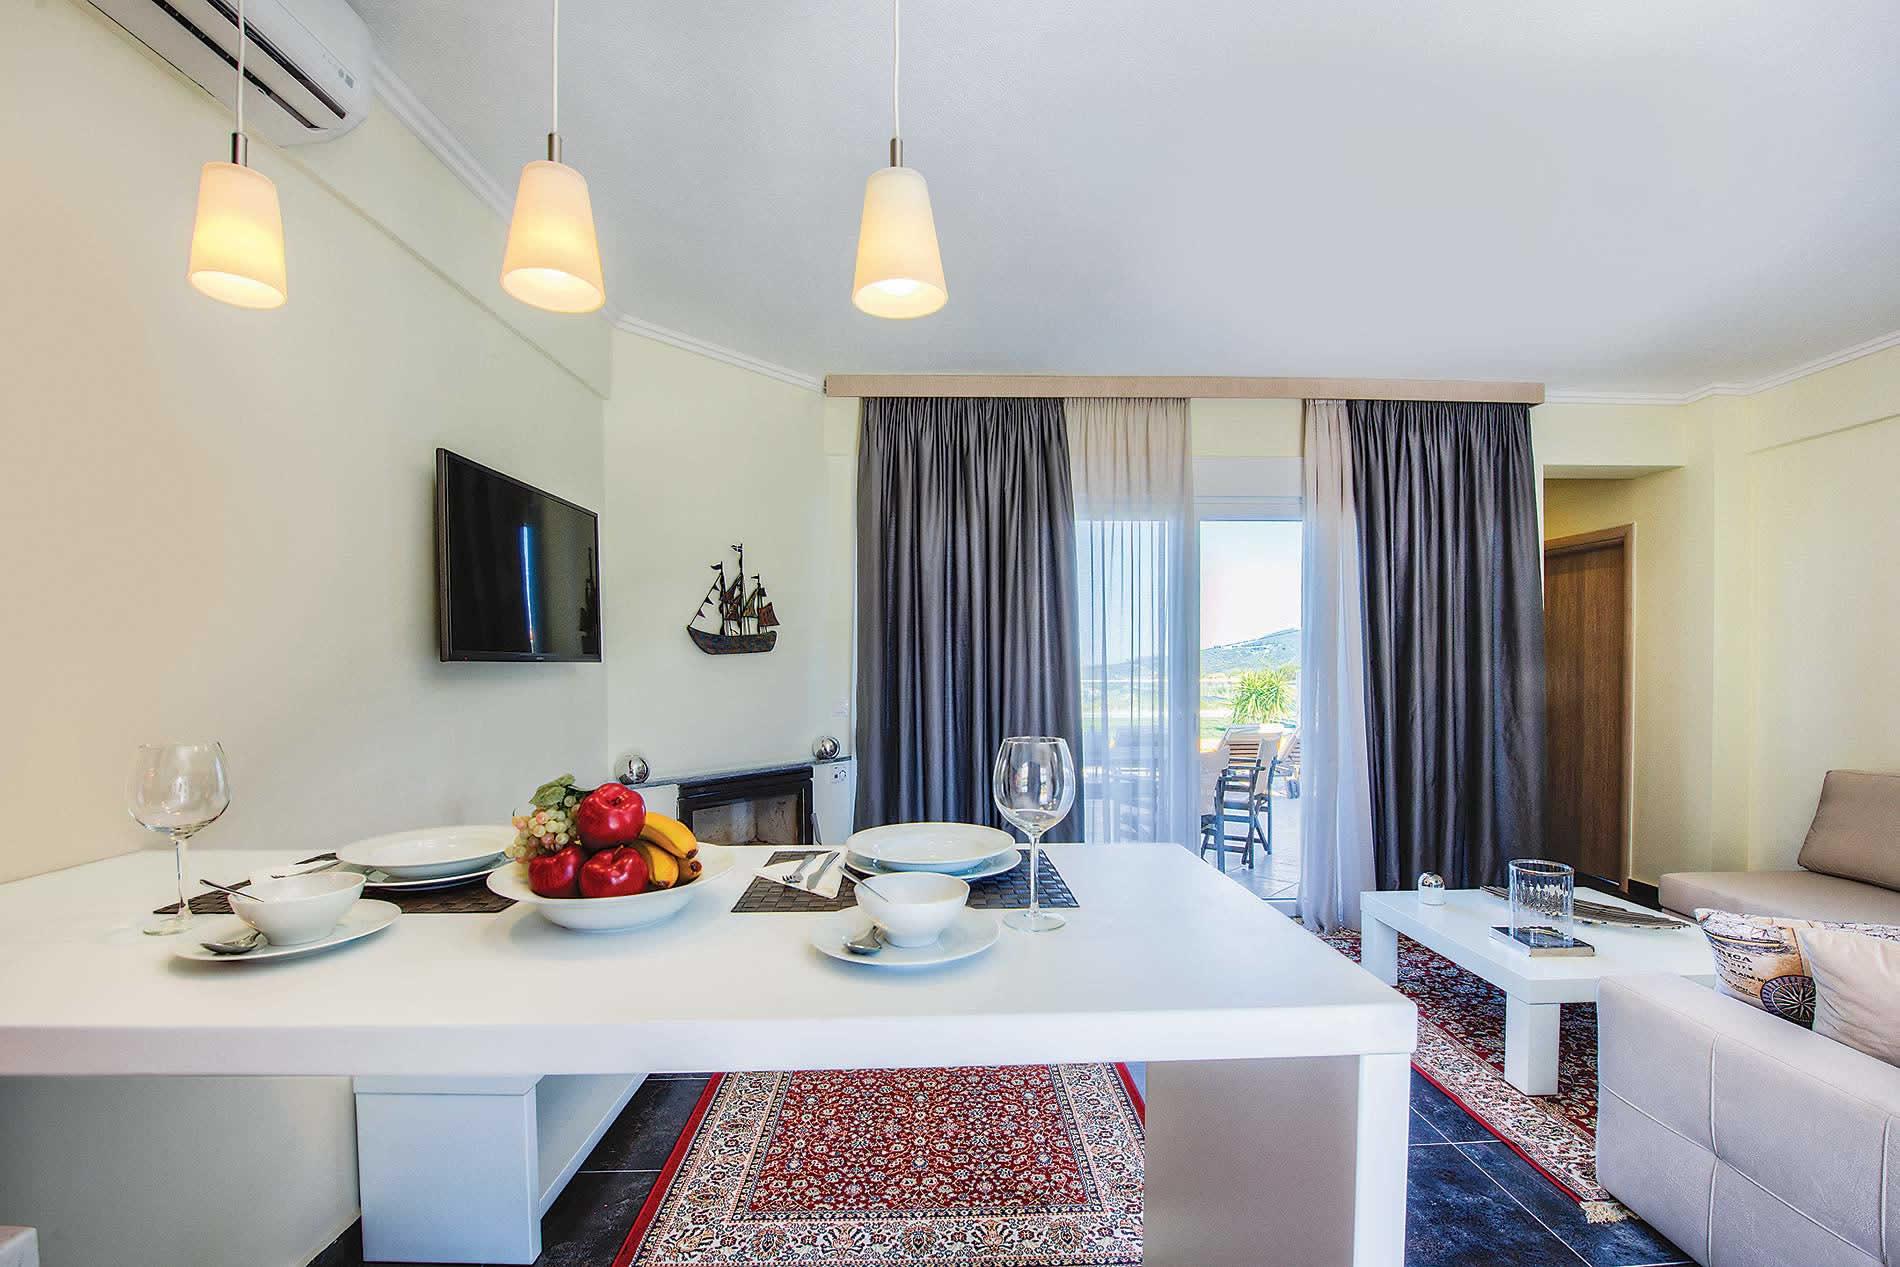 Toroneos Villas II - Heated Pool in Hanioti - sleeps 4 people